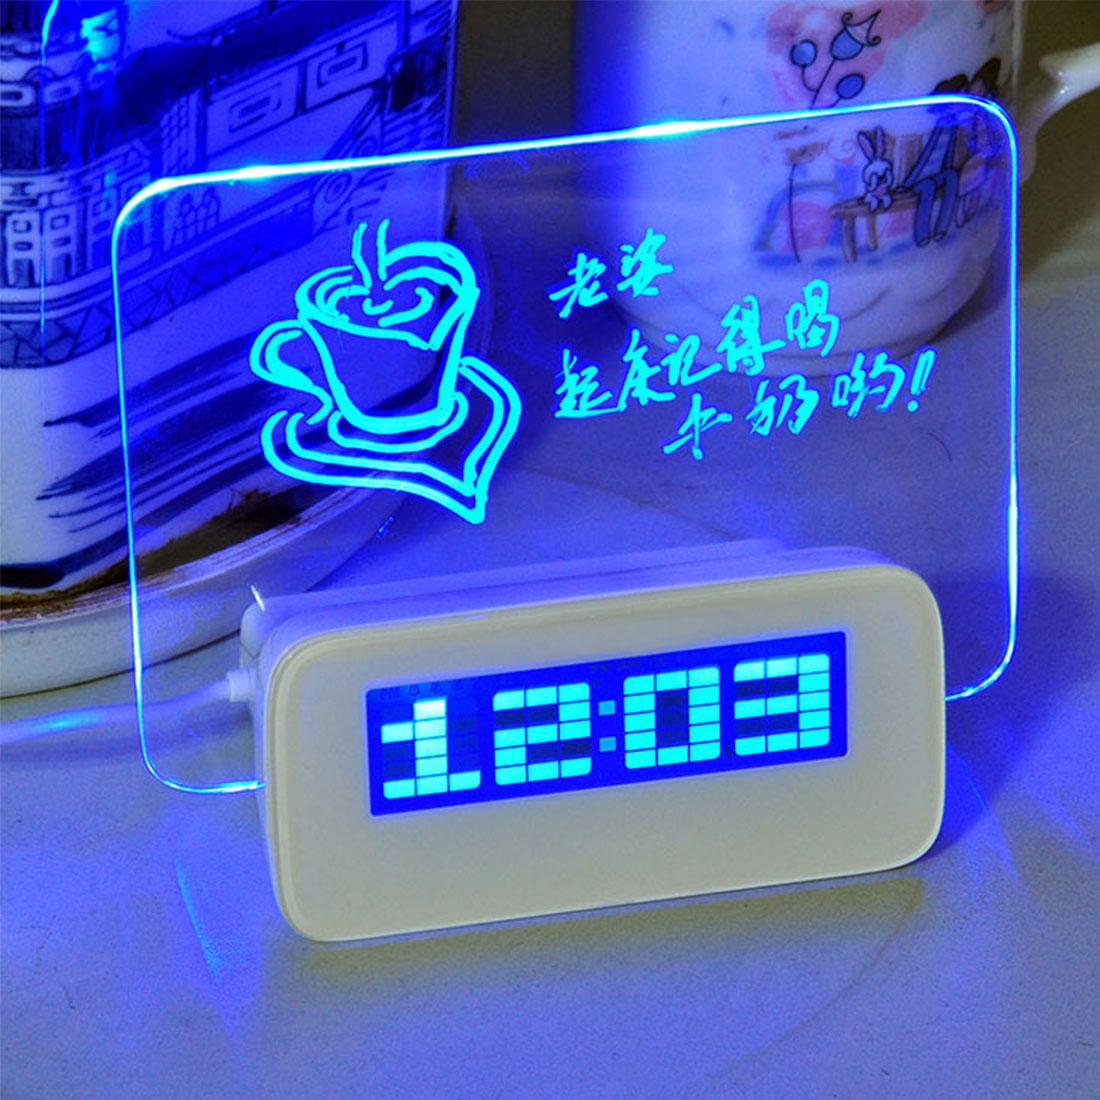 New LED Digital Clock led Luminous Message Board Alarm Clock With Calendar Desktop Clocks for Home Decor